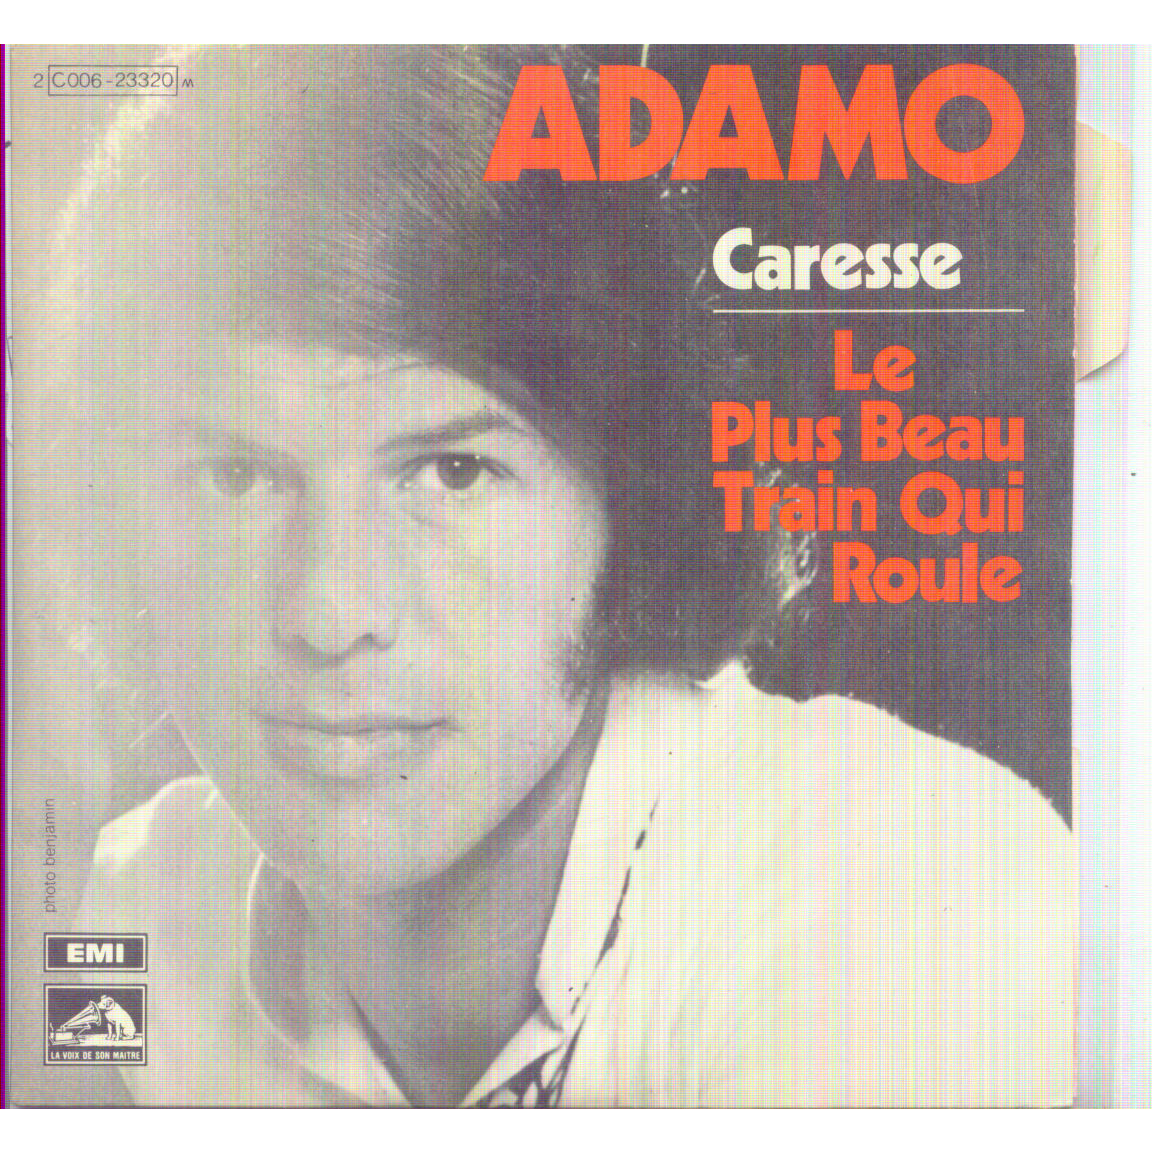 ADAMO CARESSE / LE PLUS BEAU TRAIN QUI ROULE